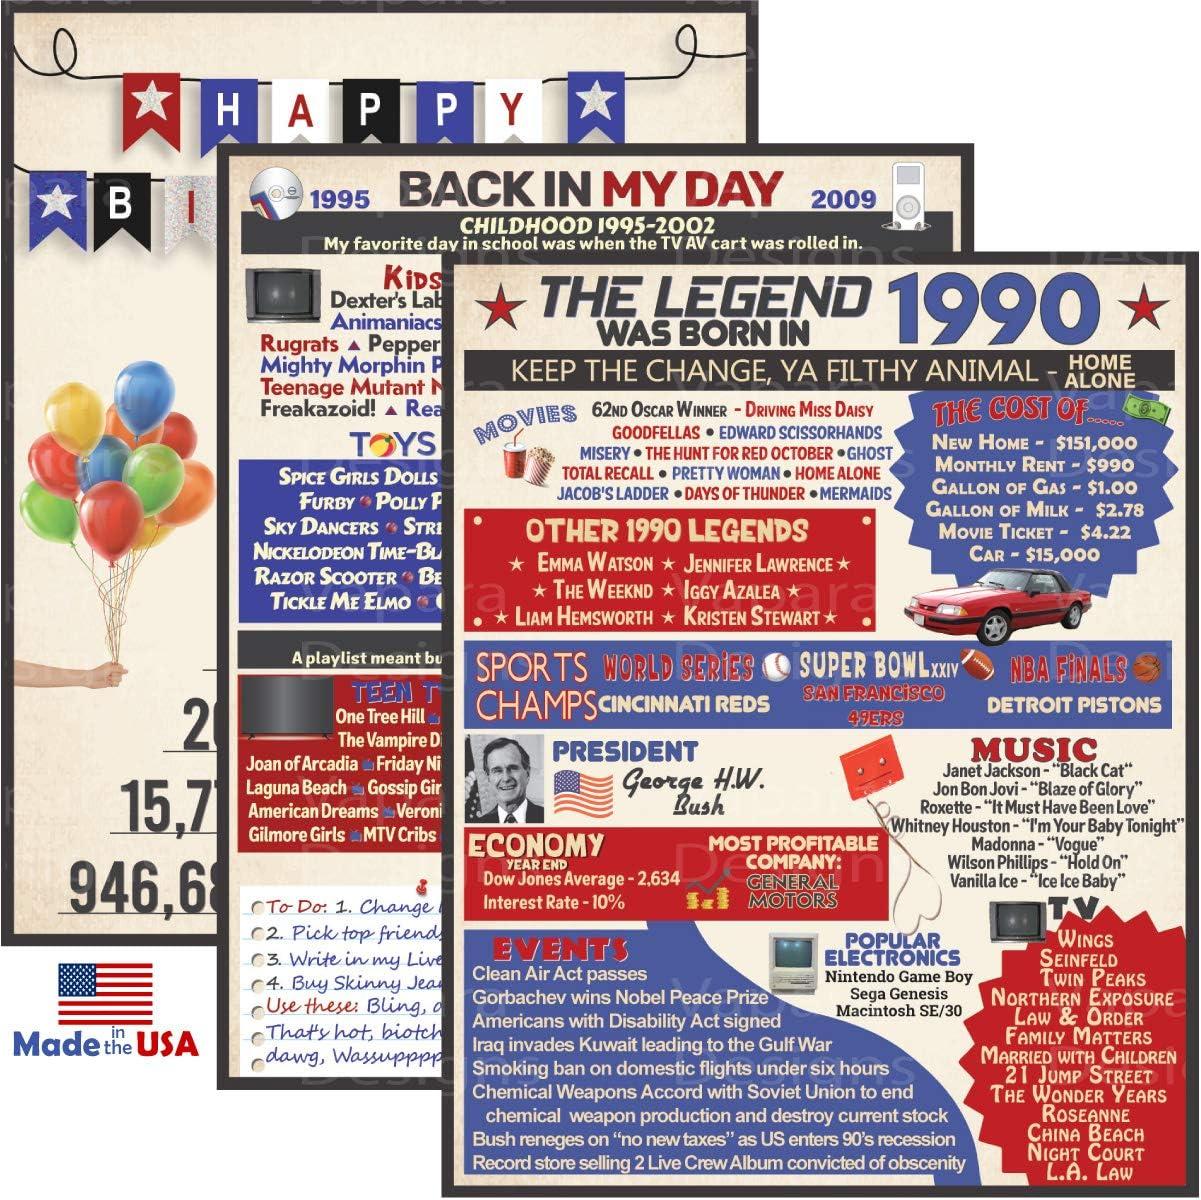 VAPARA DESIGNS 30th Birthday Decorations - 3 Pack of Fun, Artistic 8x10 Birthday Signs - 30th Birthday Gifts for Women and Men - 1990 Birthday Gifts